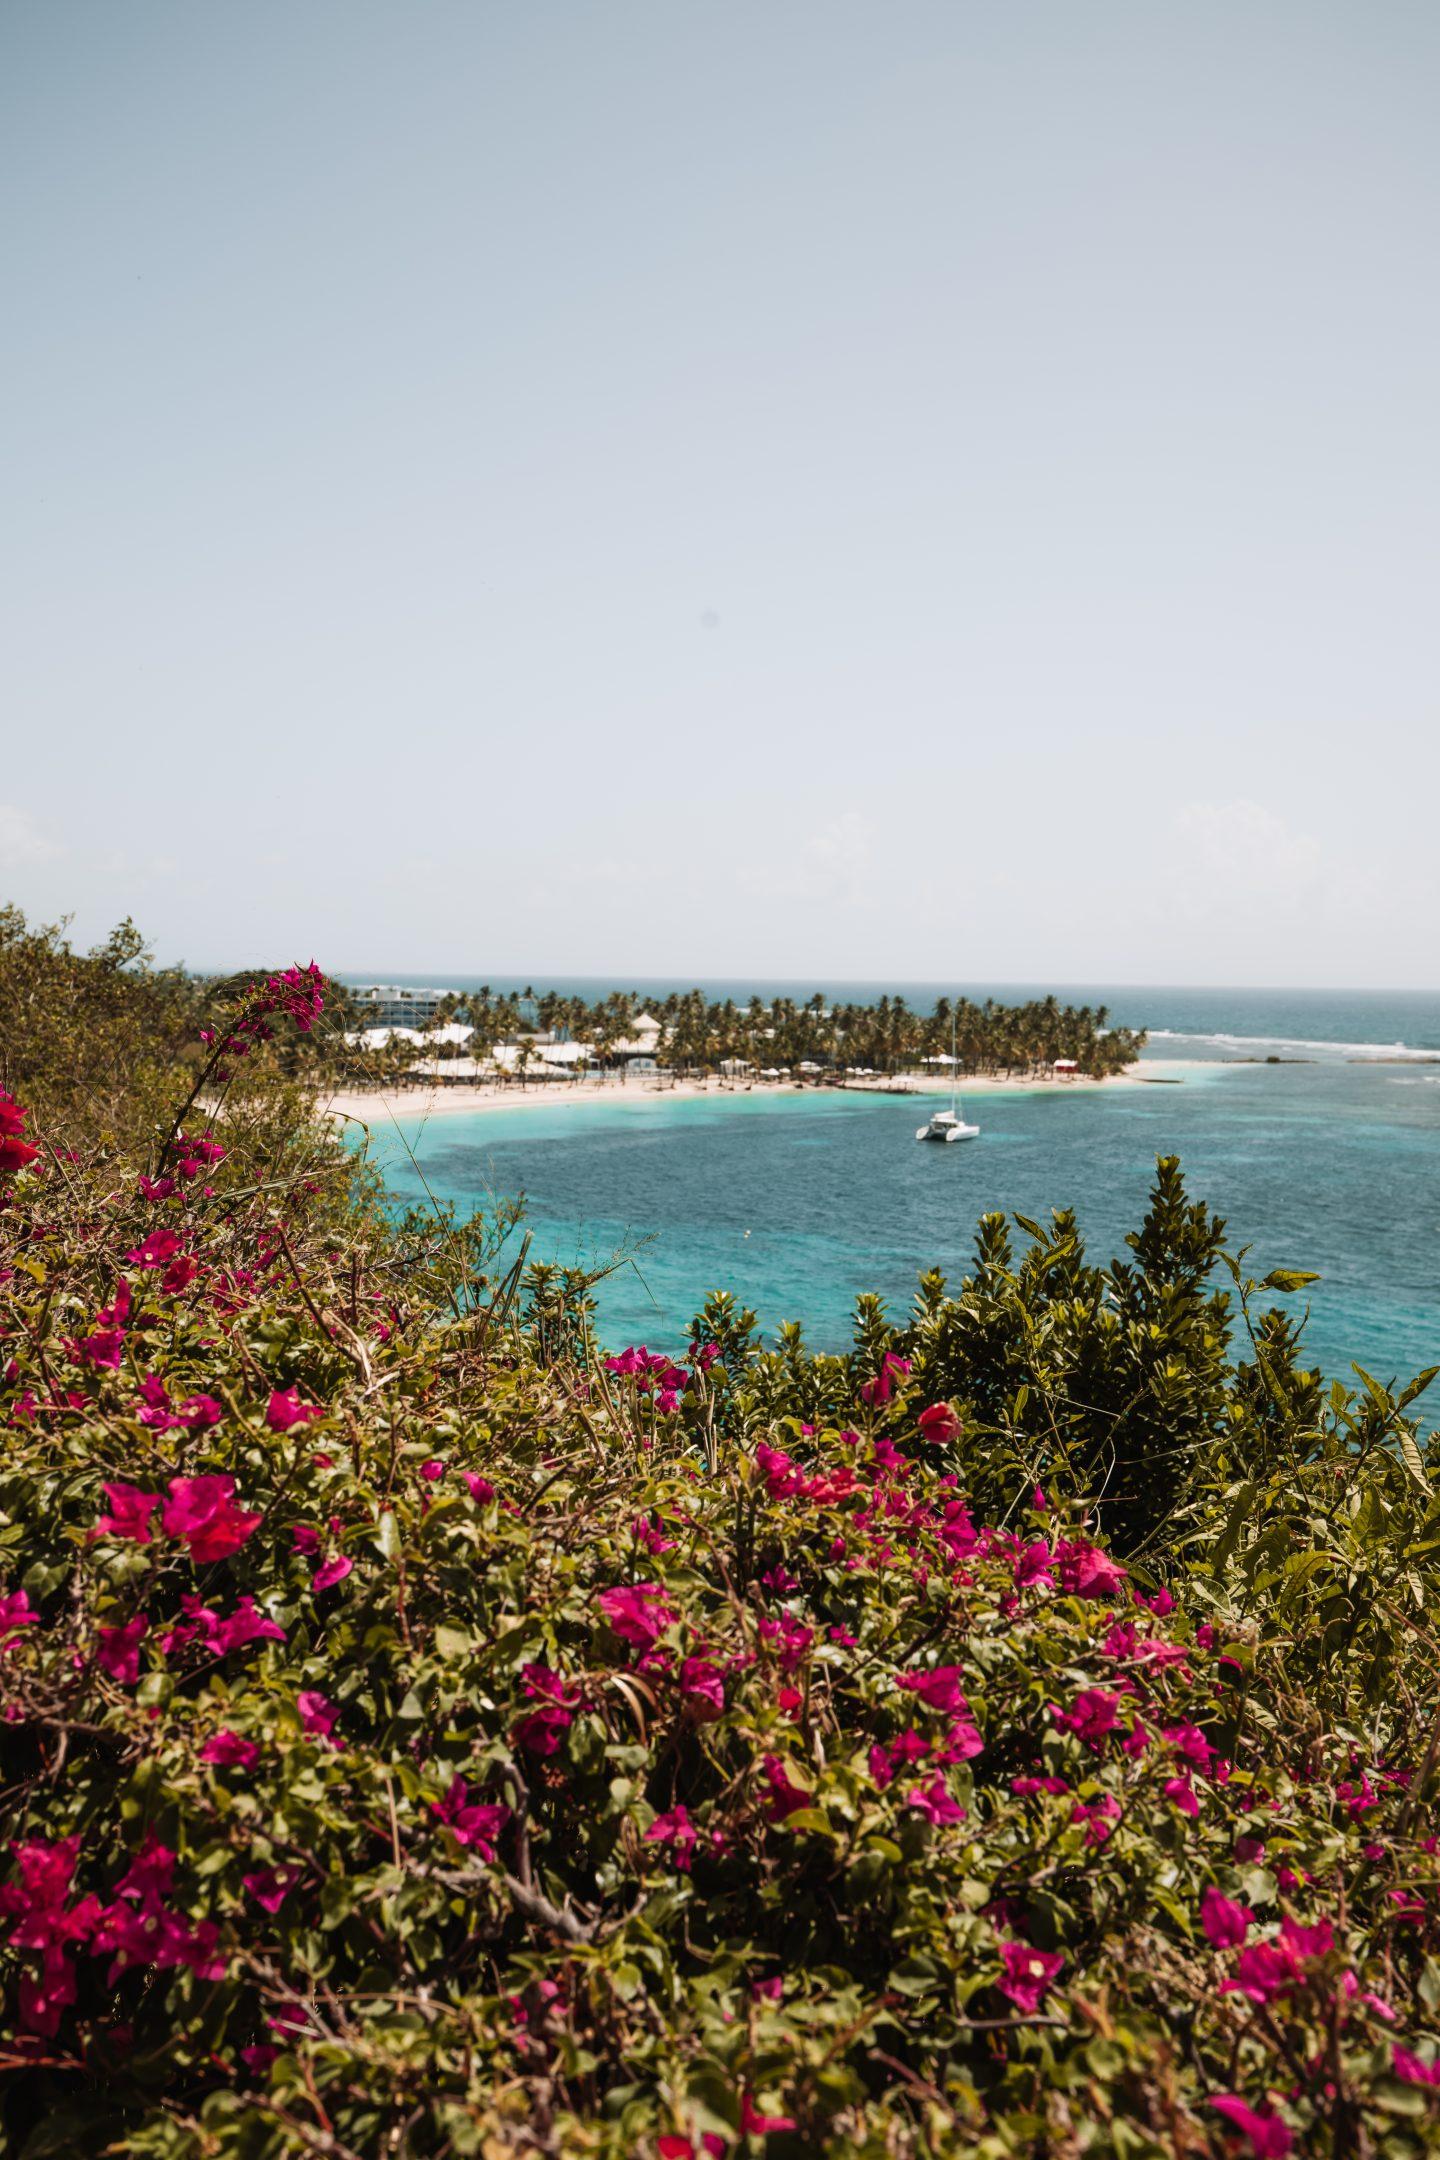 Voyager en Guadeloupe - Blondie Baby blog voyage et mode